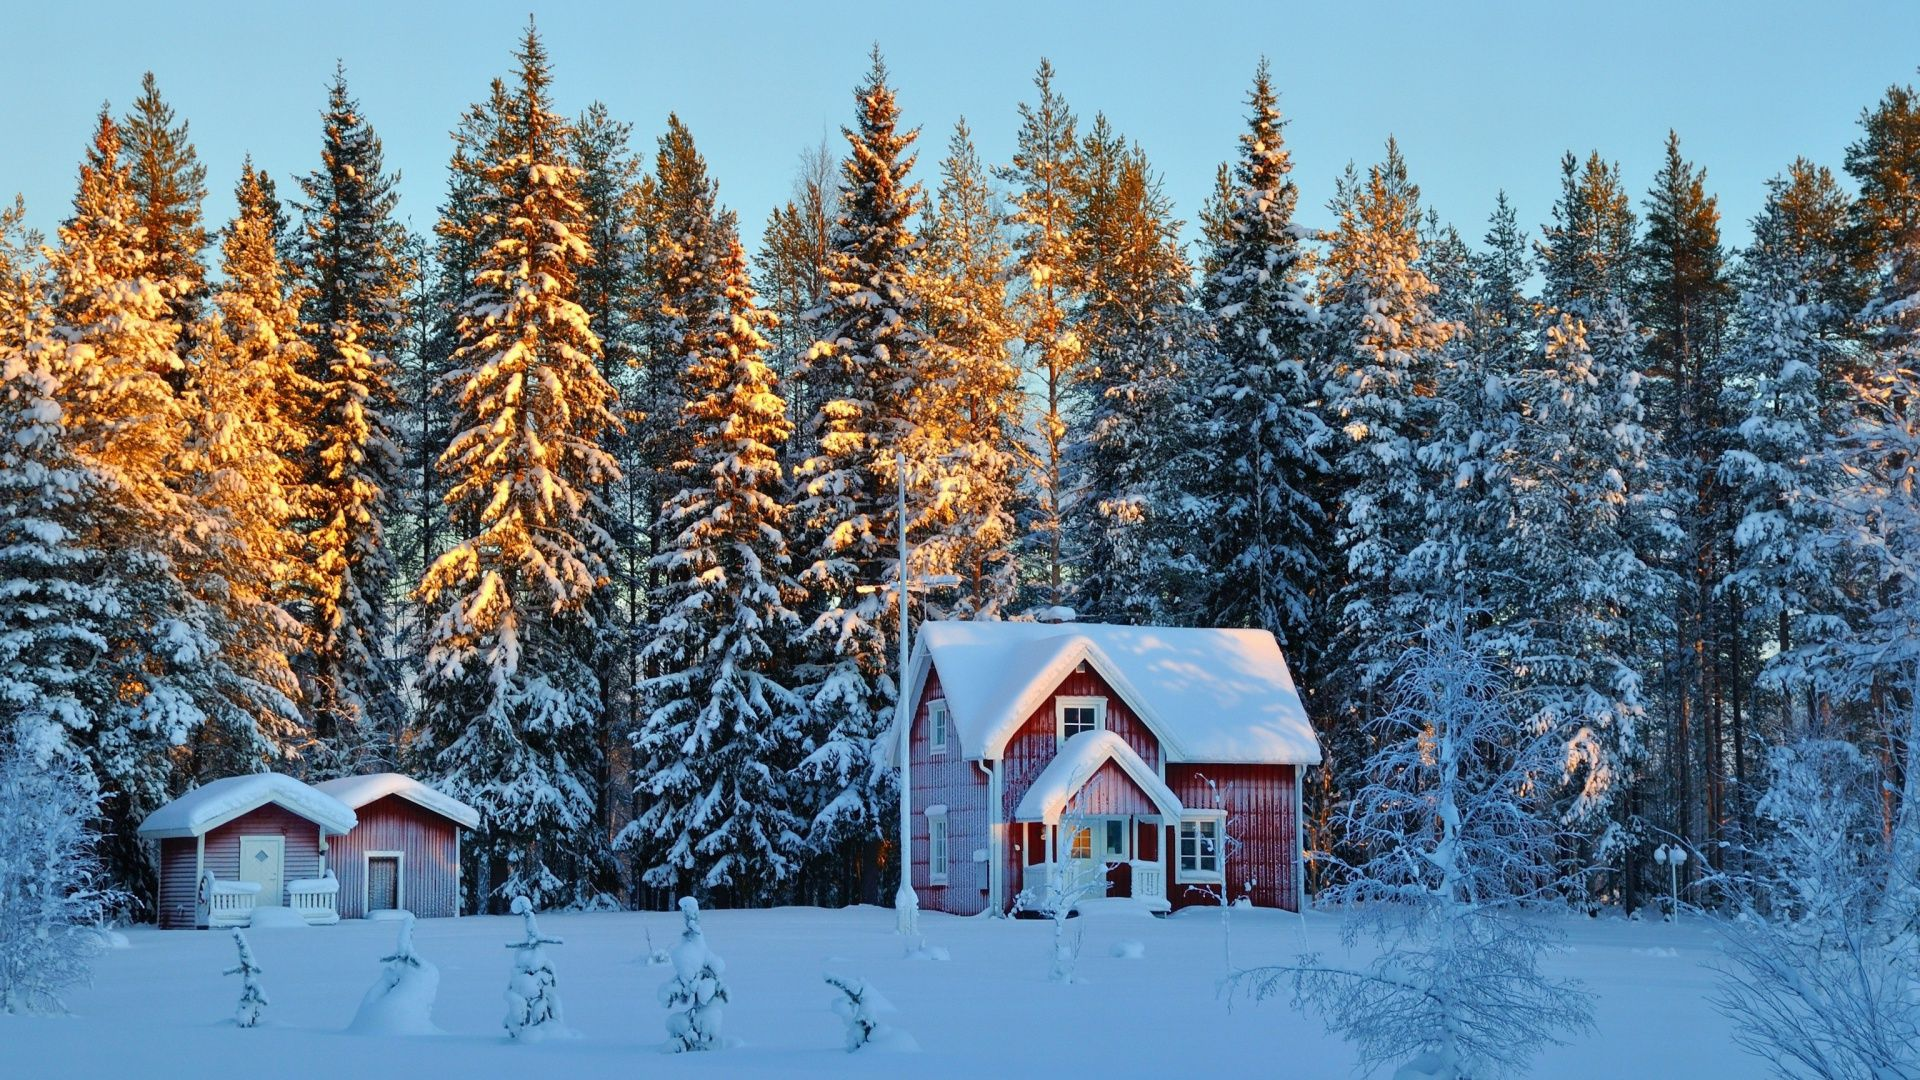 Winter Snow Scenes wallpaper image hd